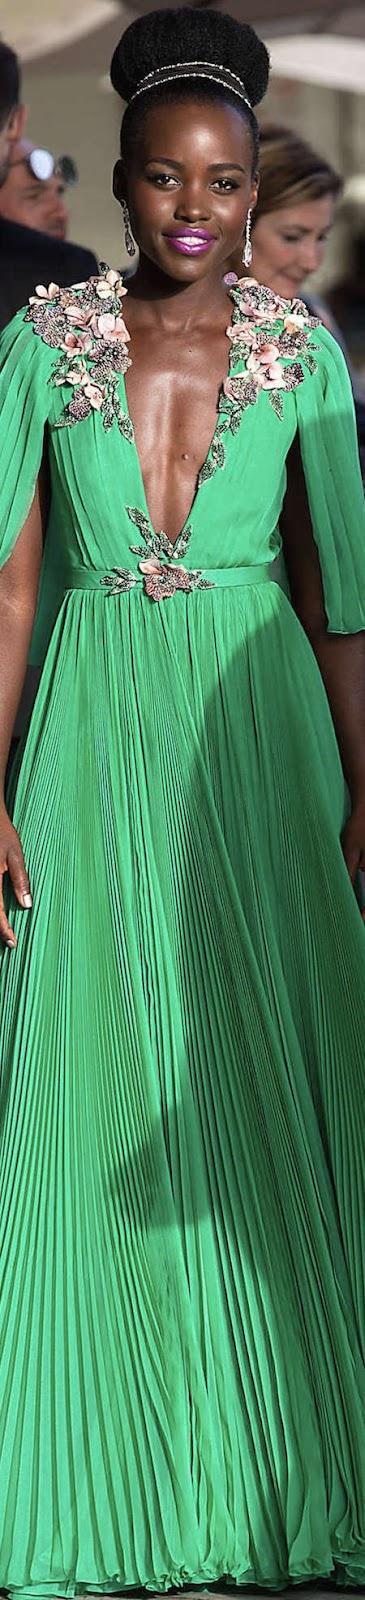 Lupita-Nyongo-in-Green-Dress--04.jpg